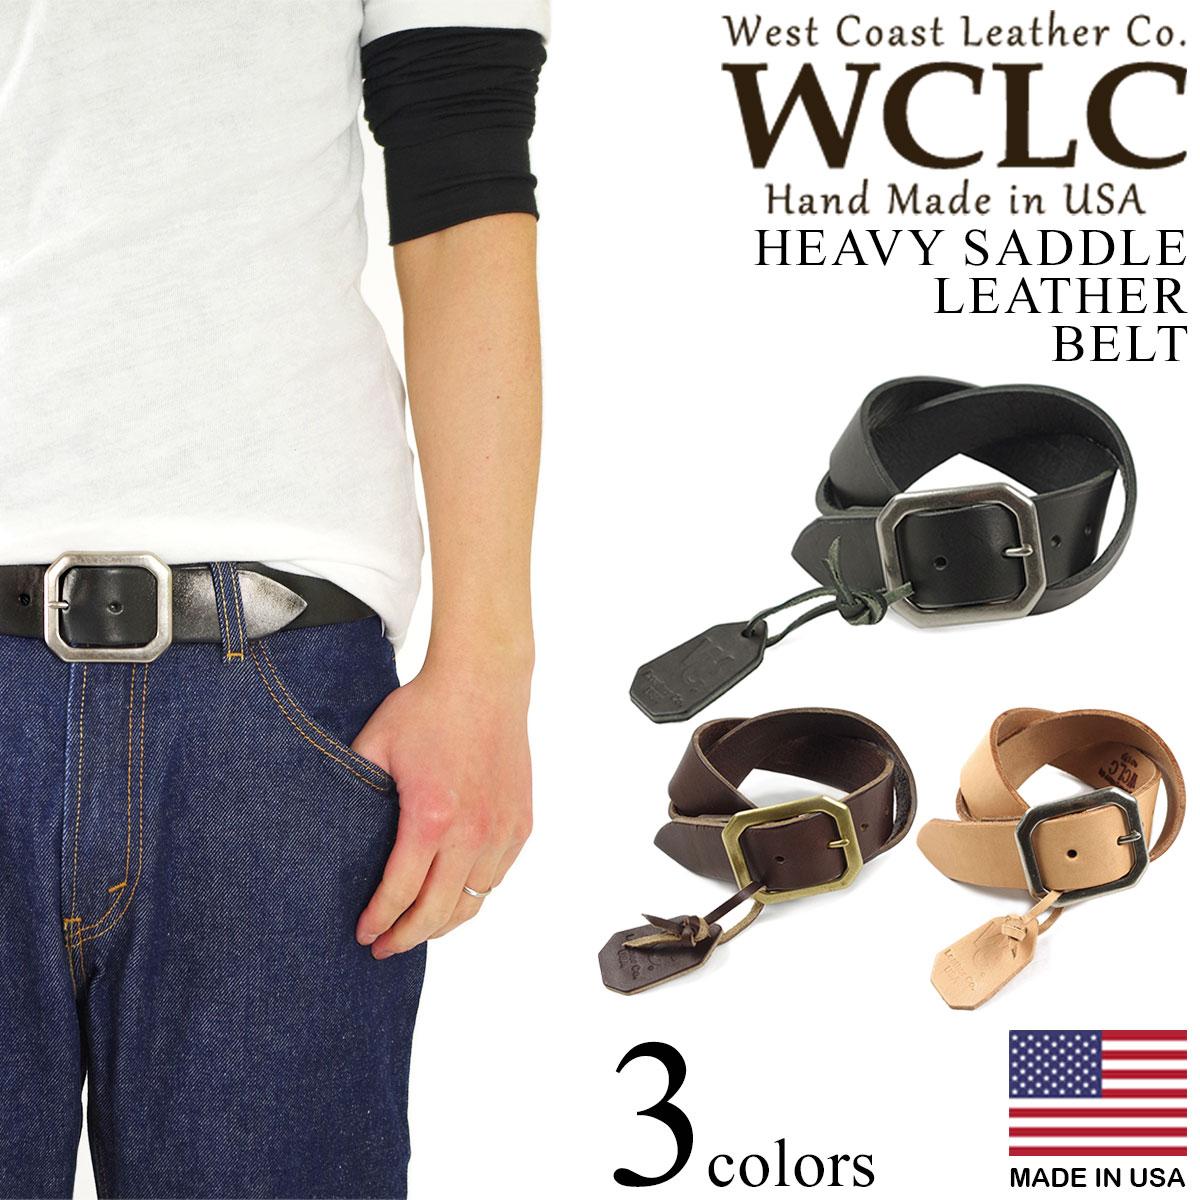 WCLC ウエストコーストレザーカンパニー ヘビーサドルレザーベルト アメリカ製 米国製 (4.5~5mm厚 West Coast Leather Company MADE IN USA)